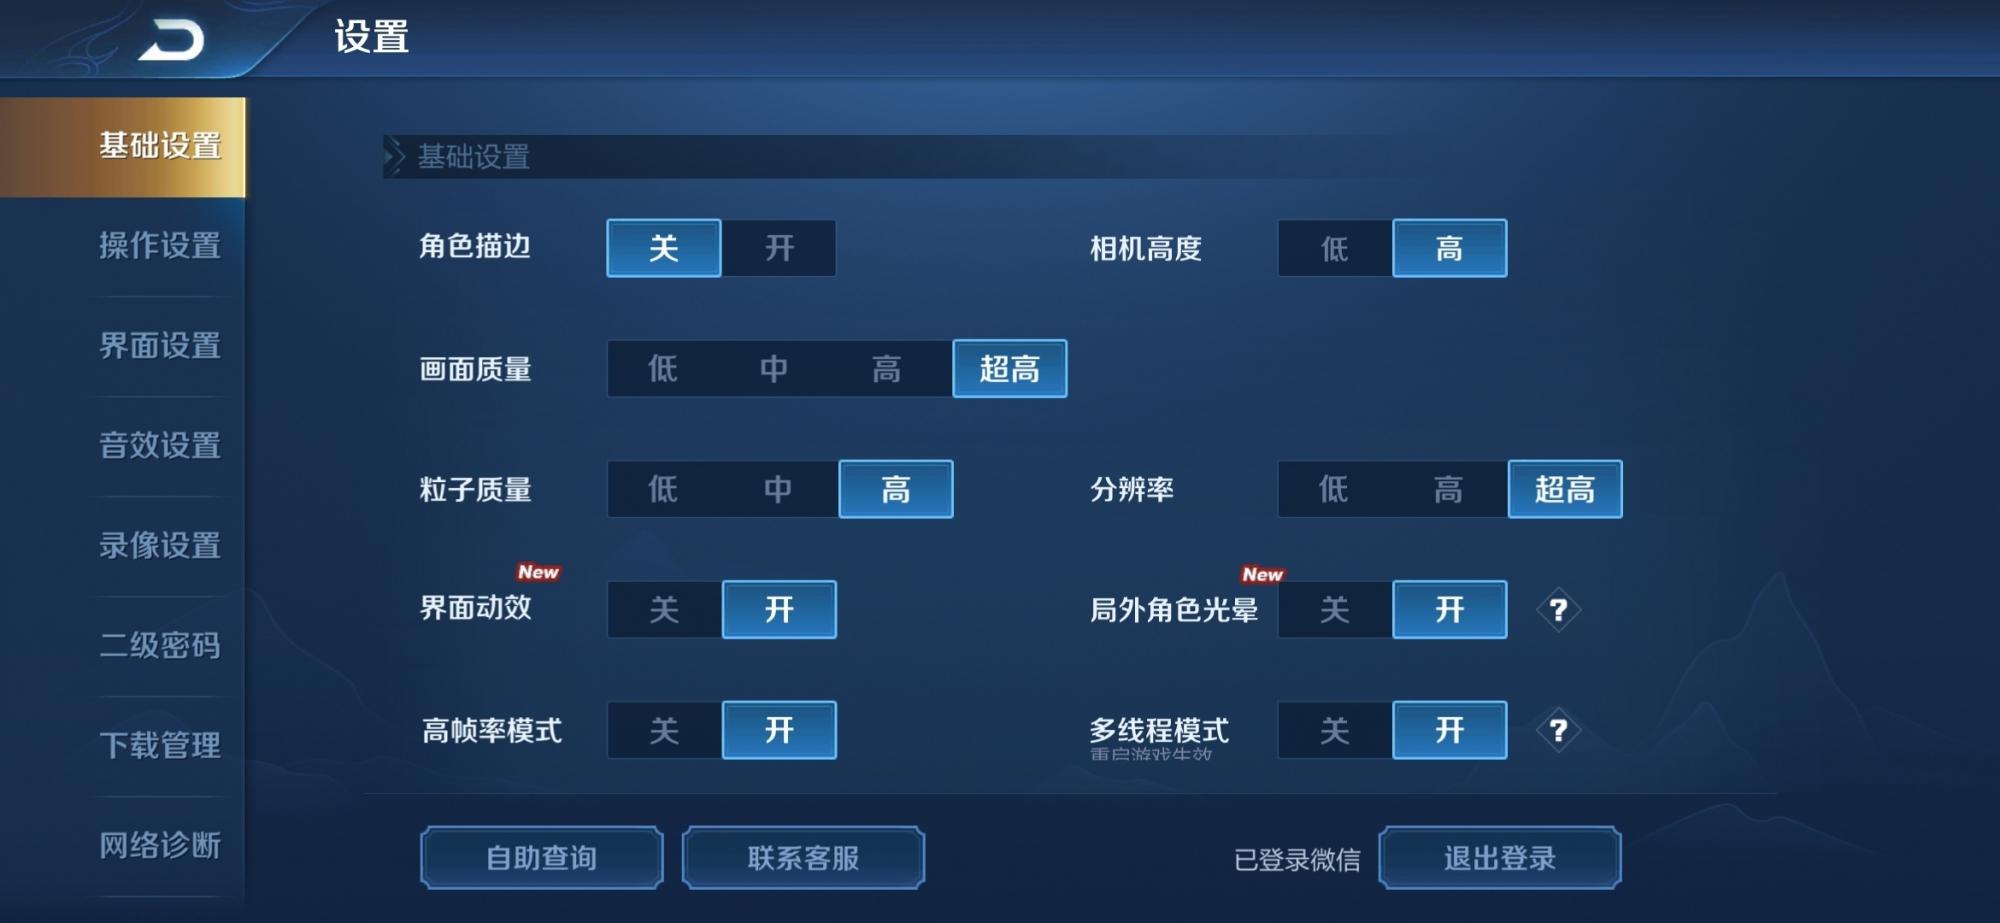 Screenshot_20190527_081905_com.tencent.tmgp.sgame.jpg